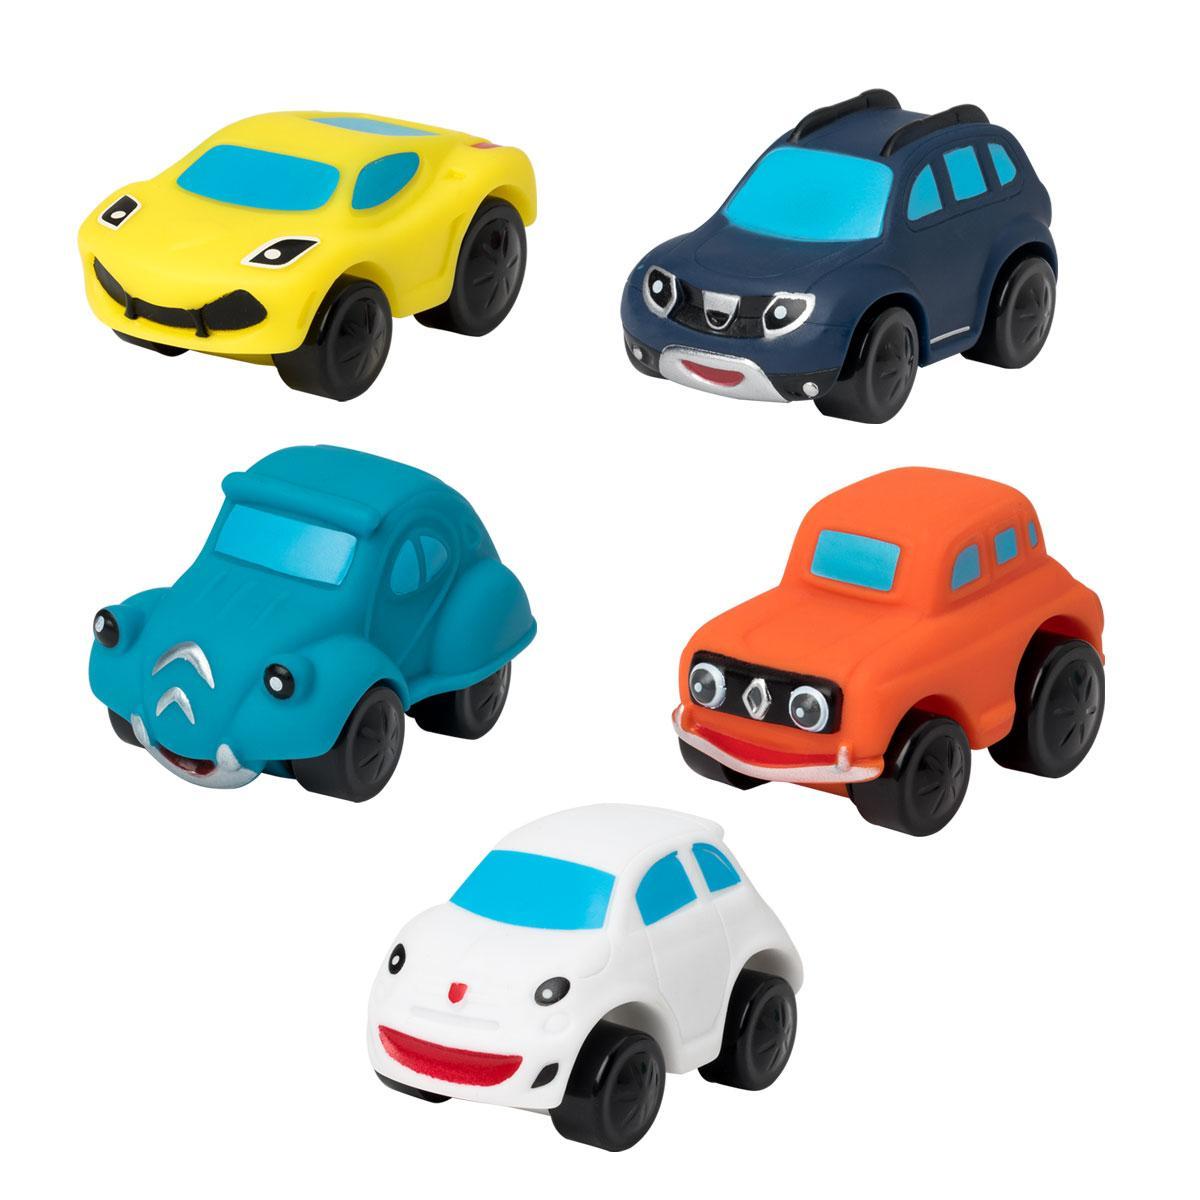 Set de 5 voitures